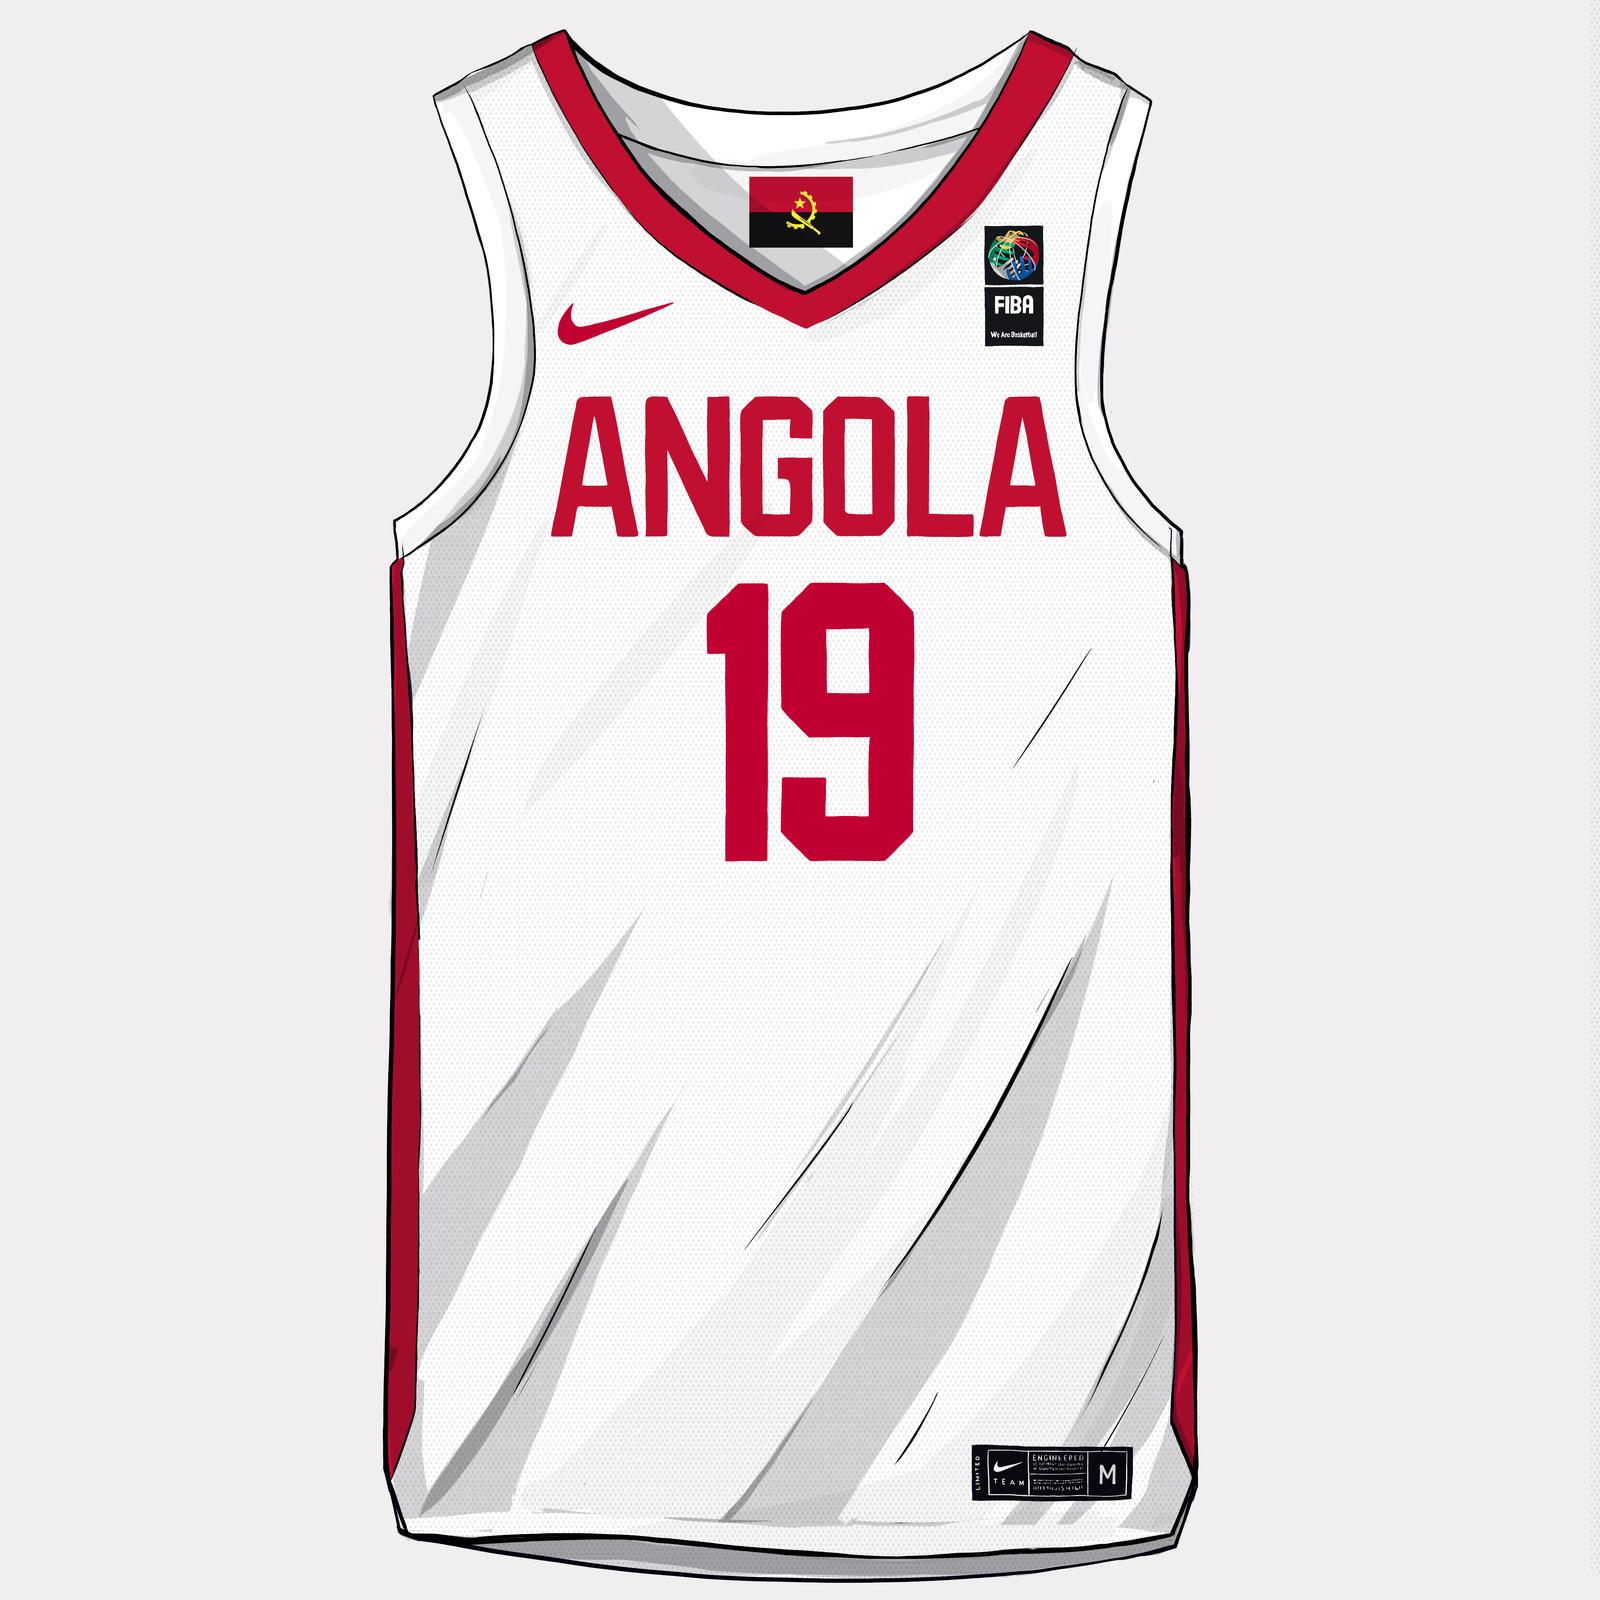 nike-news-angola-national-team-kit-2019-illustration-1x1_2_89520.jpg